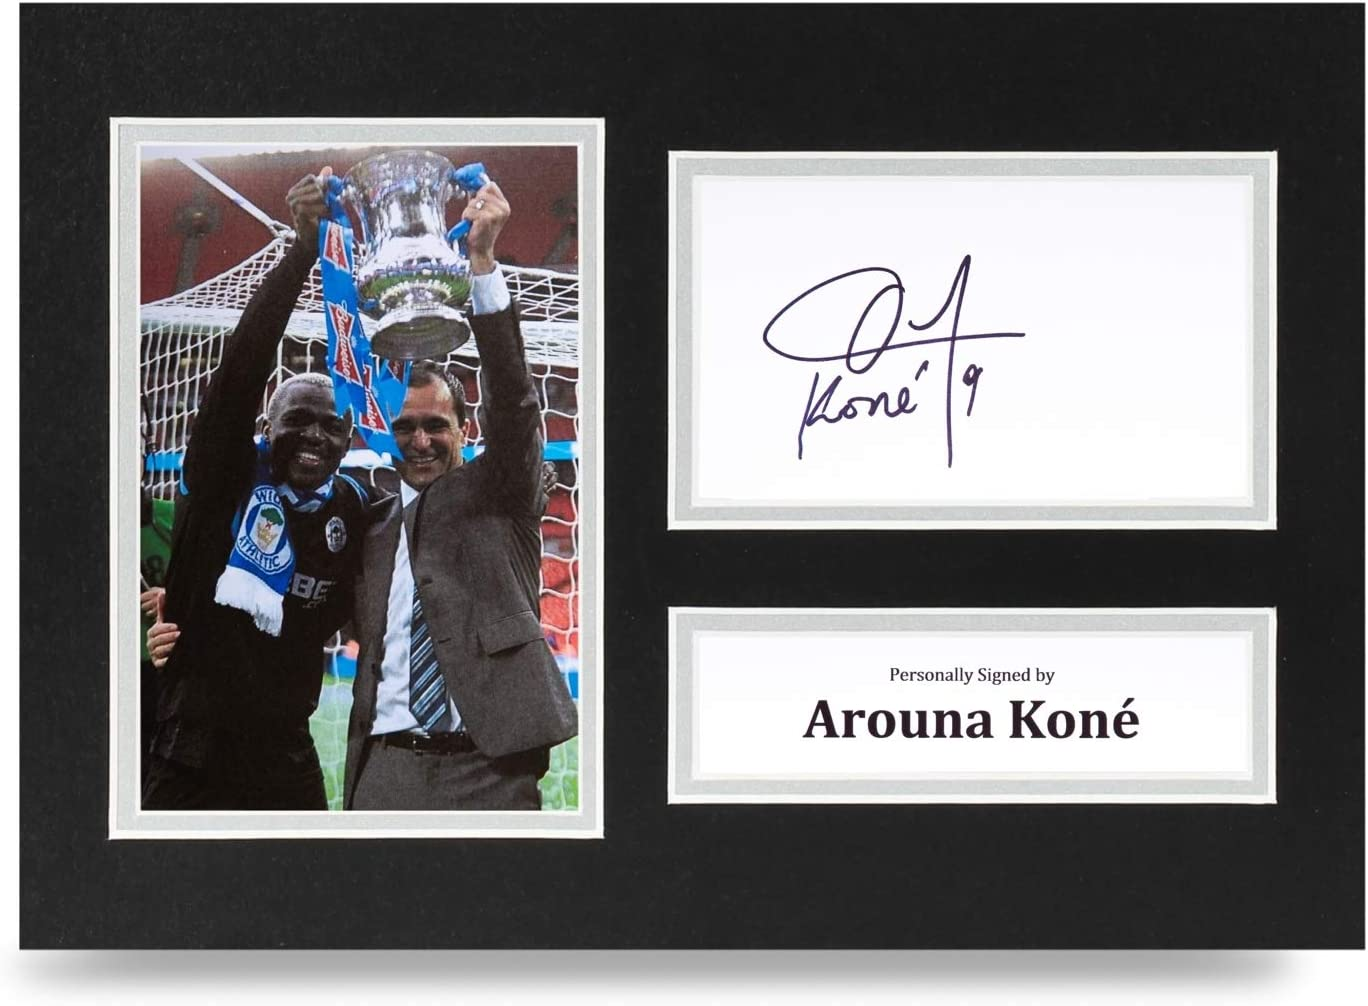 COA Arouna Kone Signed A4 Photo Display Wigan Athletic Autograph Memorabilia